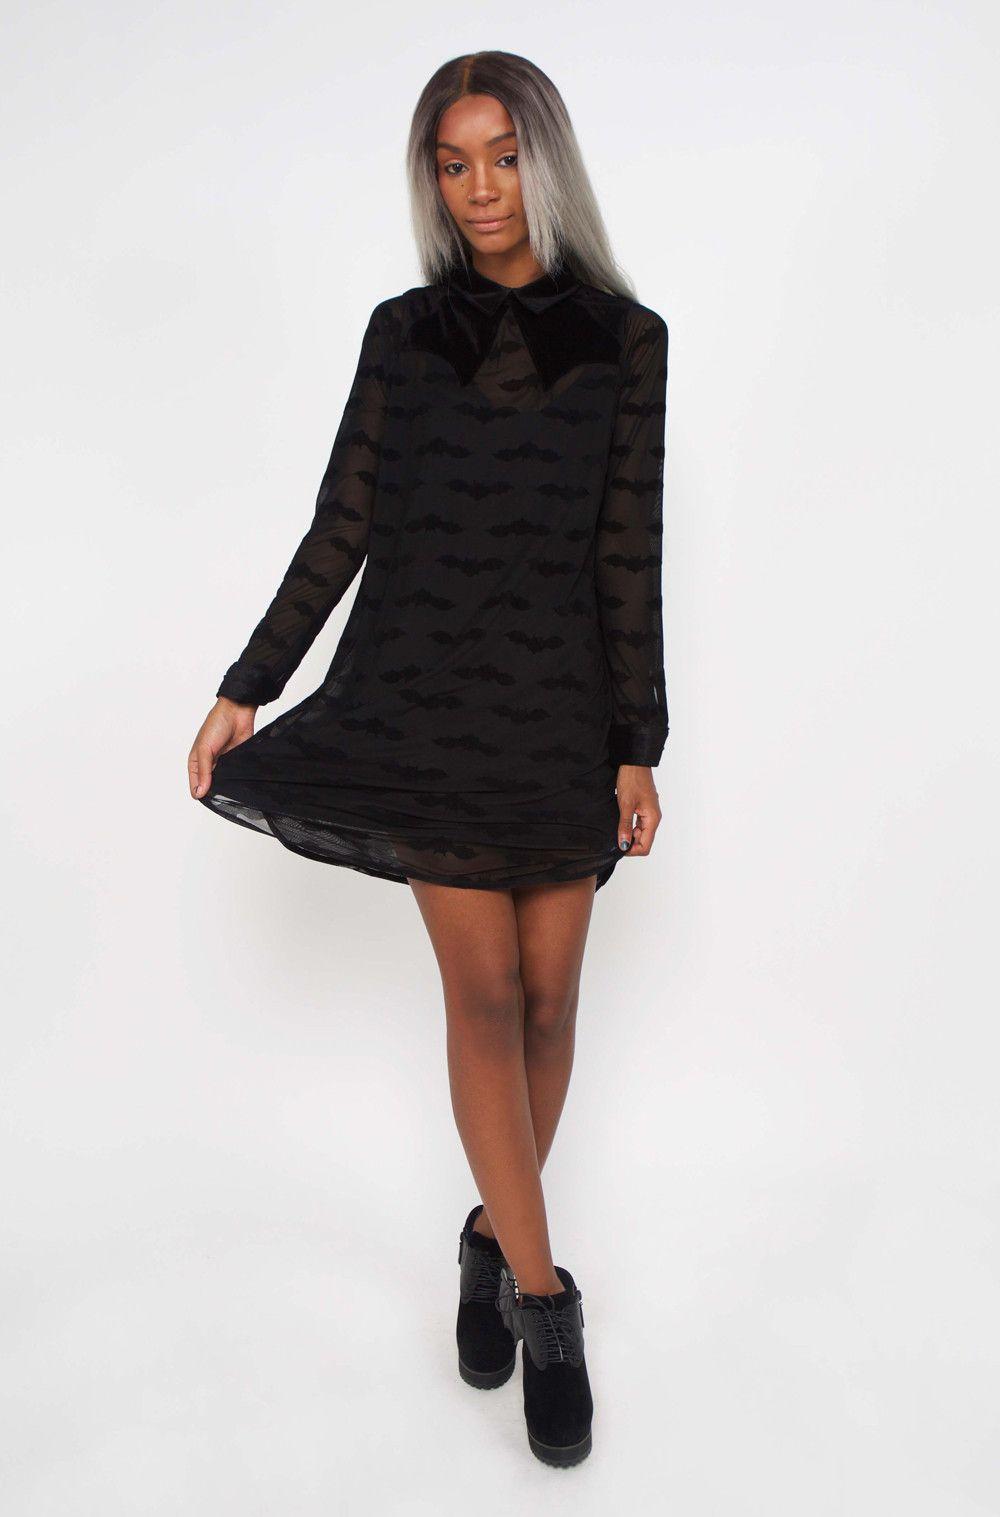 🕷 Madamned Shirt Dress 🕷